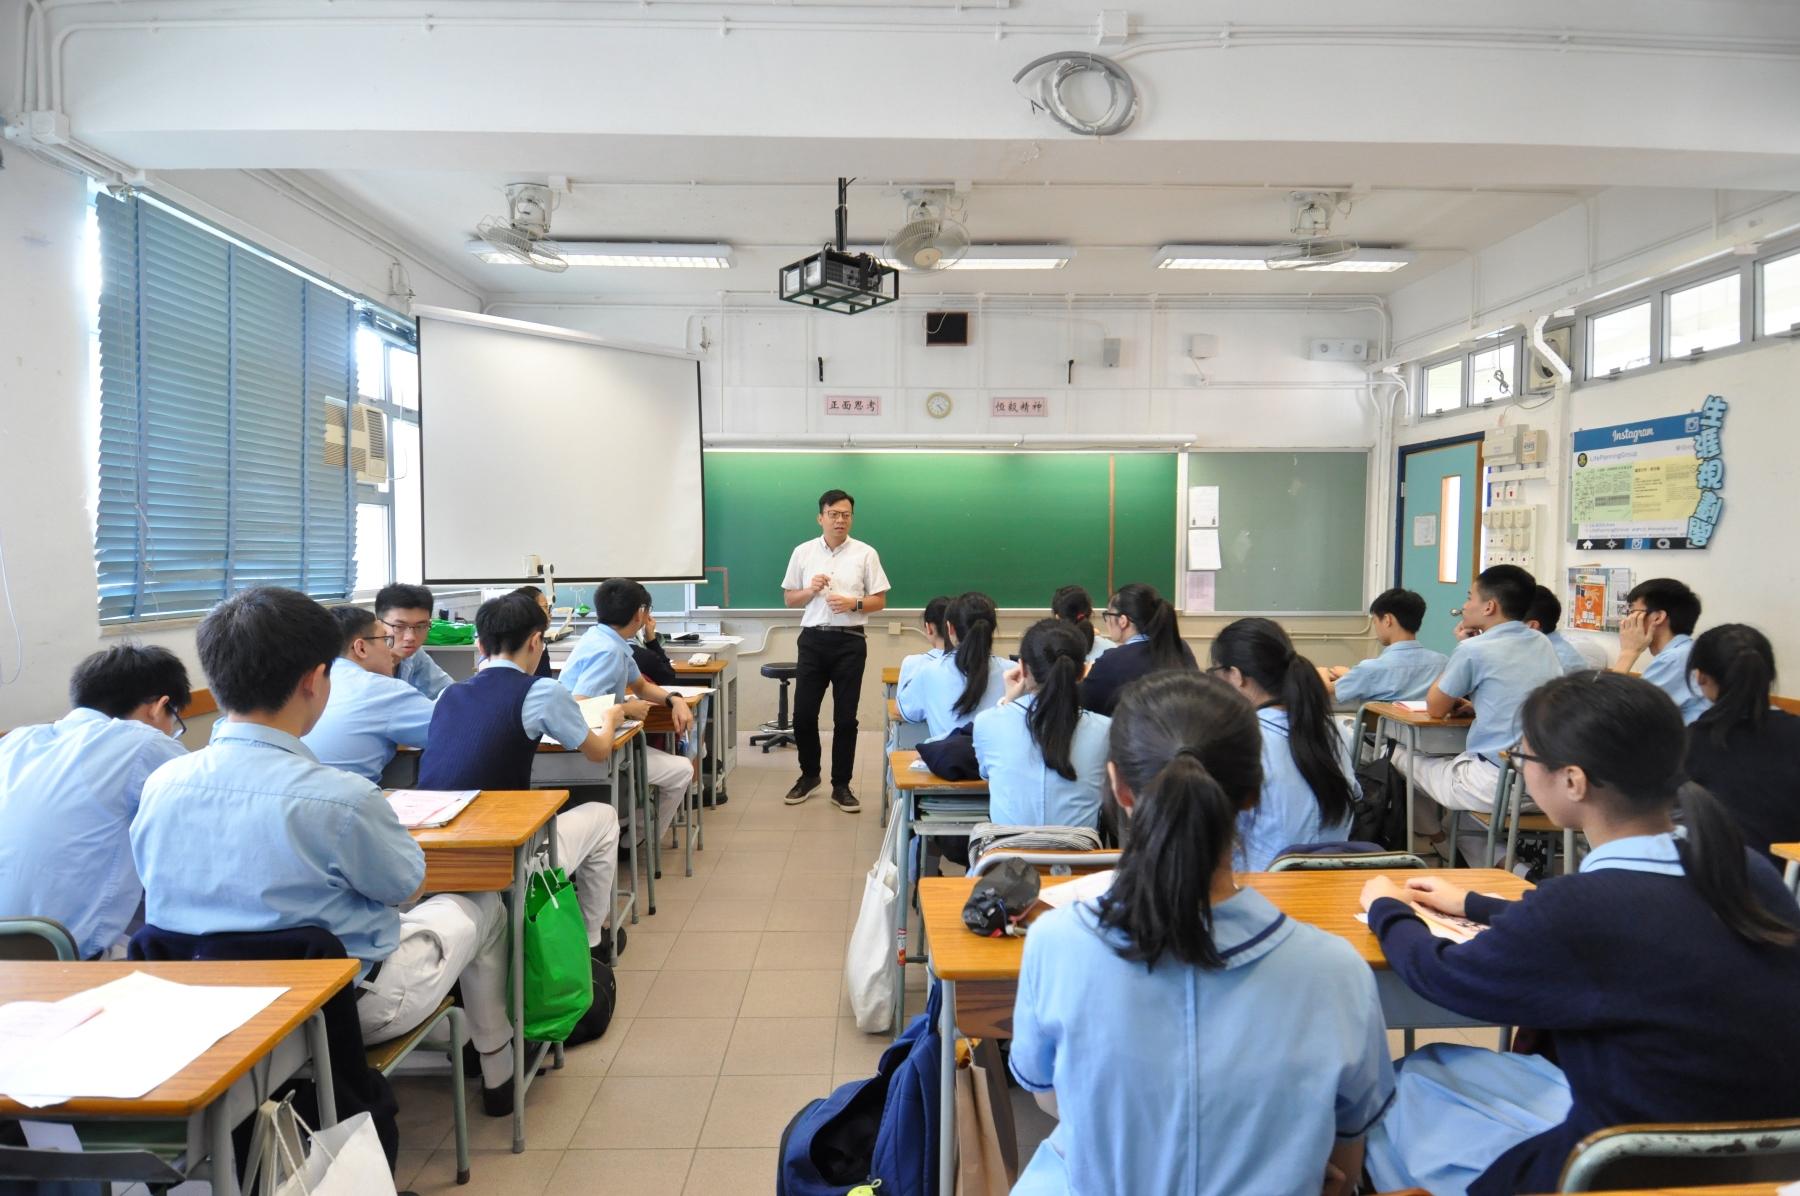 http://www.npc.edu.hk/sites/default/files/dsc_0226_1.jpg